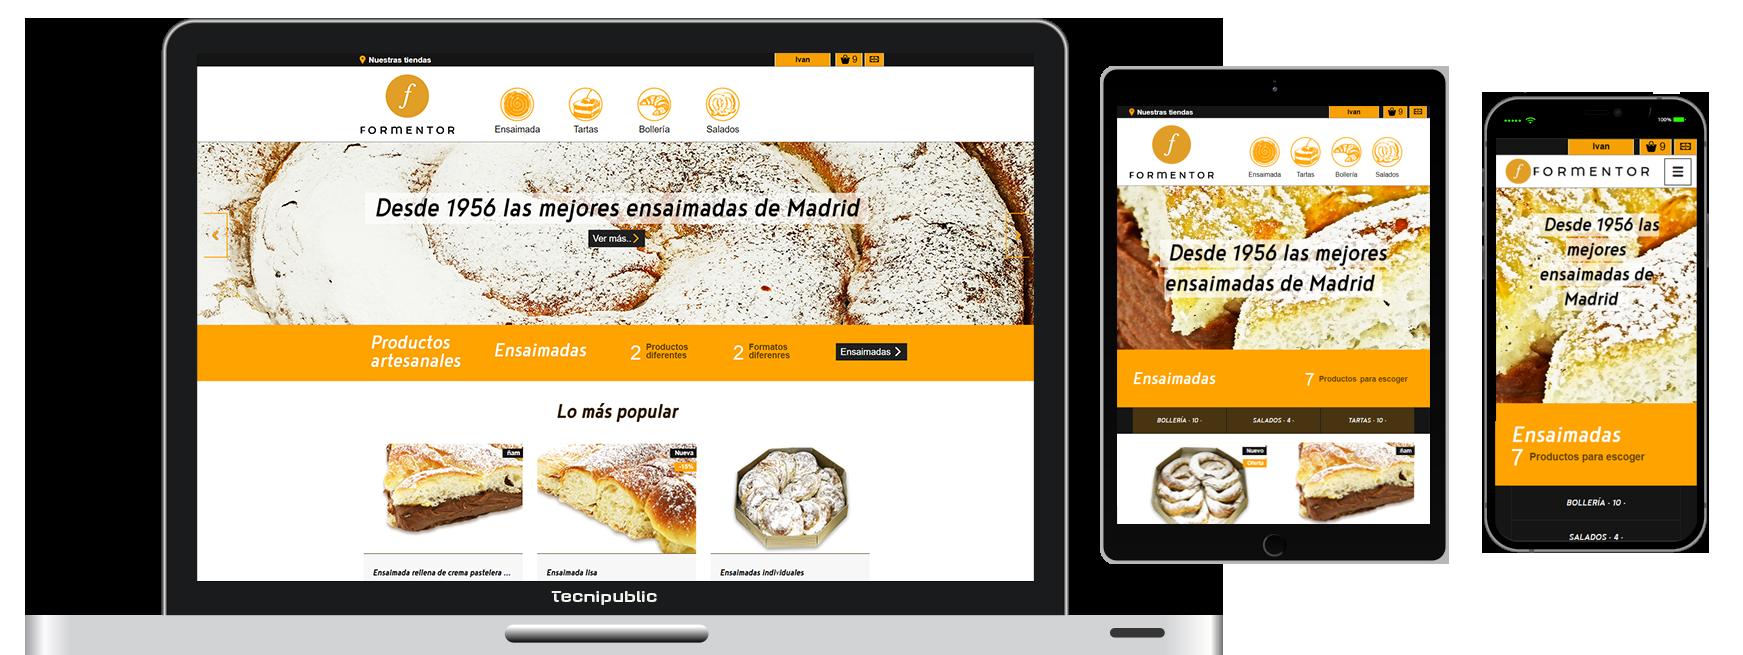 Web diseño fluido para Formentor - 2017